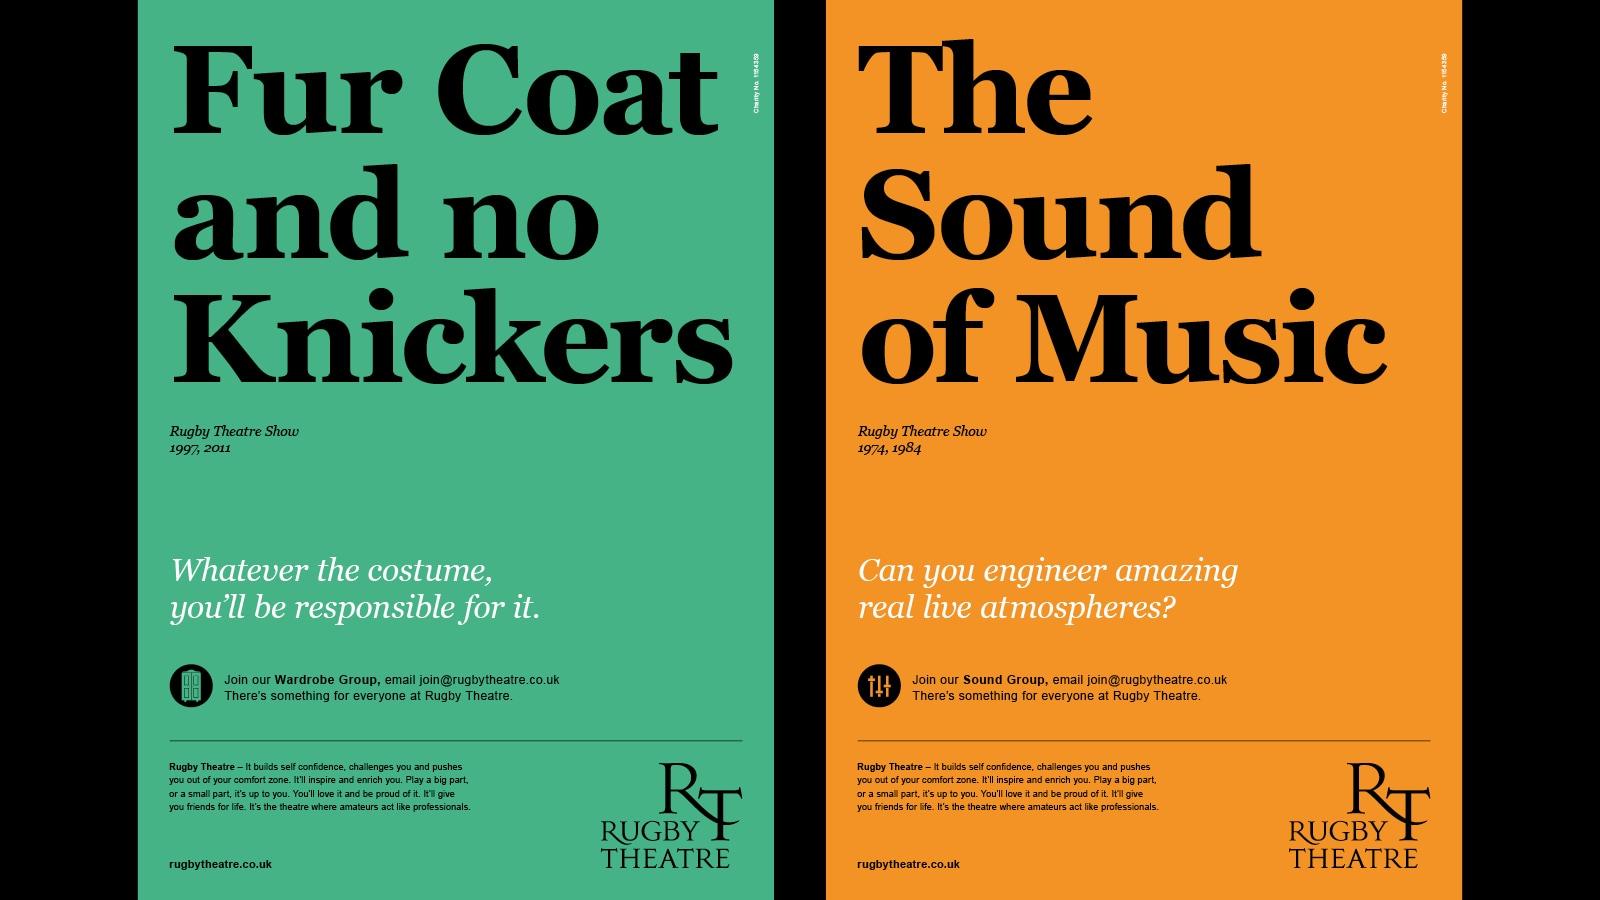 identity-design-theatre-branding-logo-milton-keynes-london-6